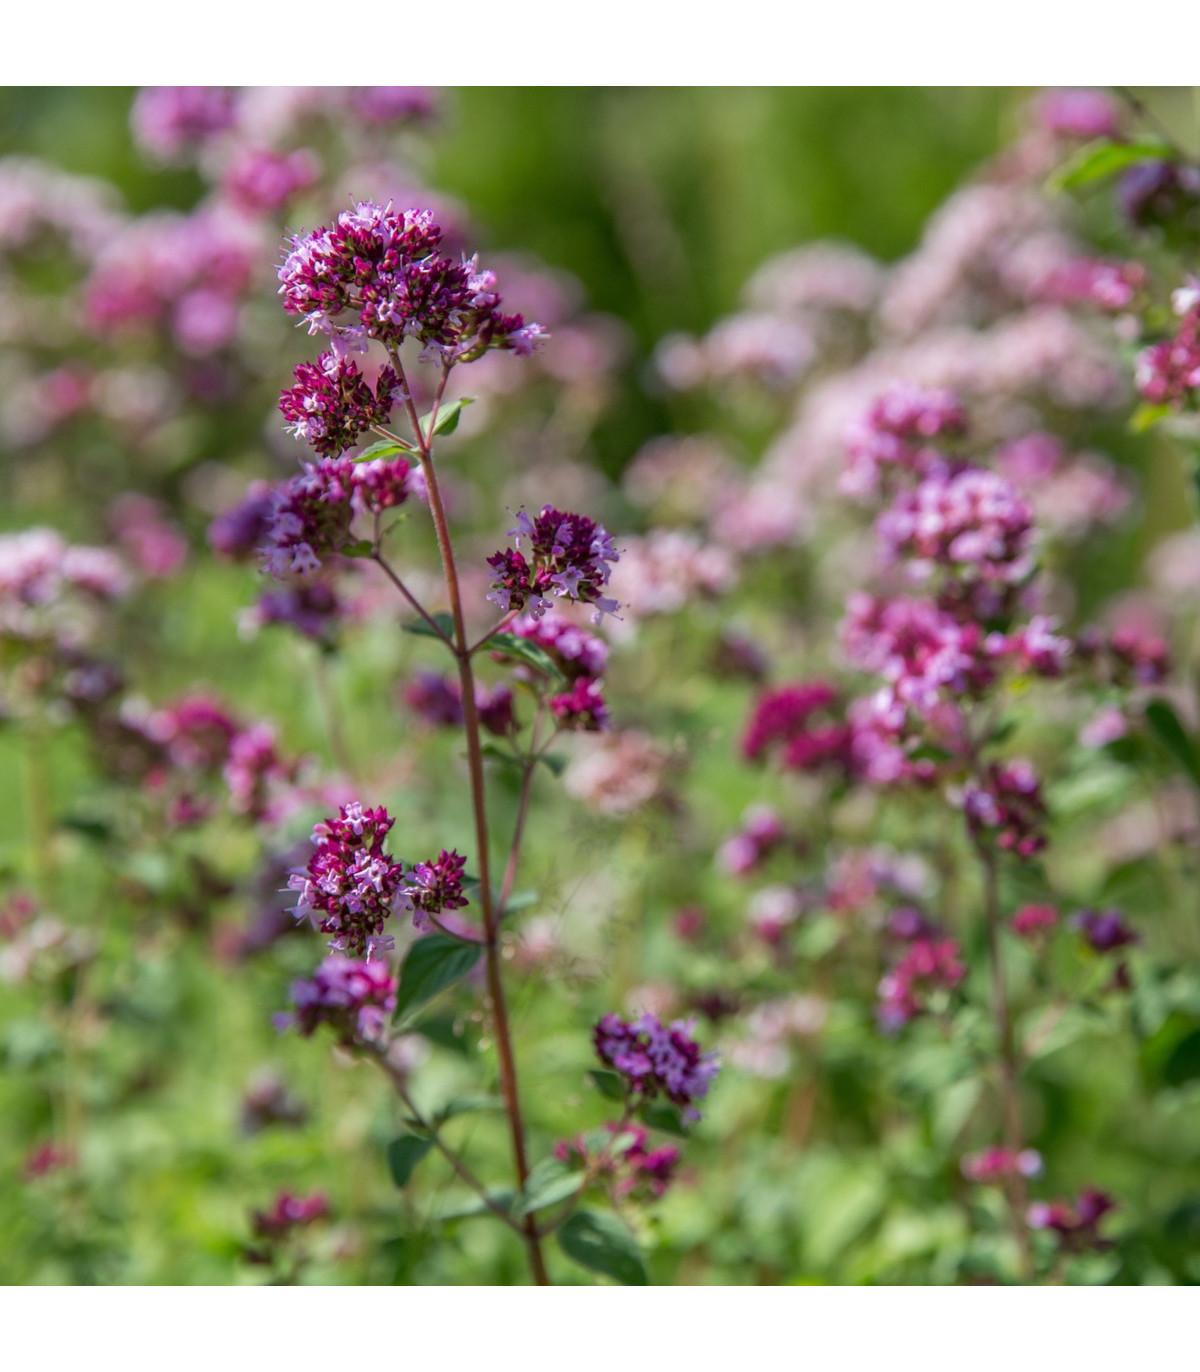 Bio pamajorán obyčajný - Origanum vulgare - bio semená pamajoránu - 0,3 g